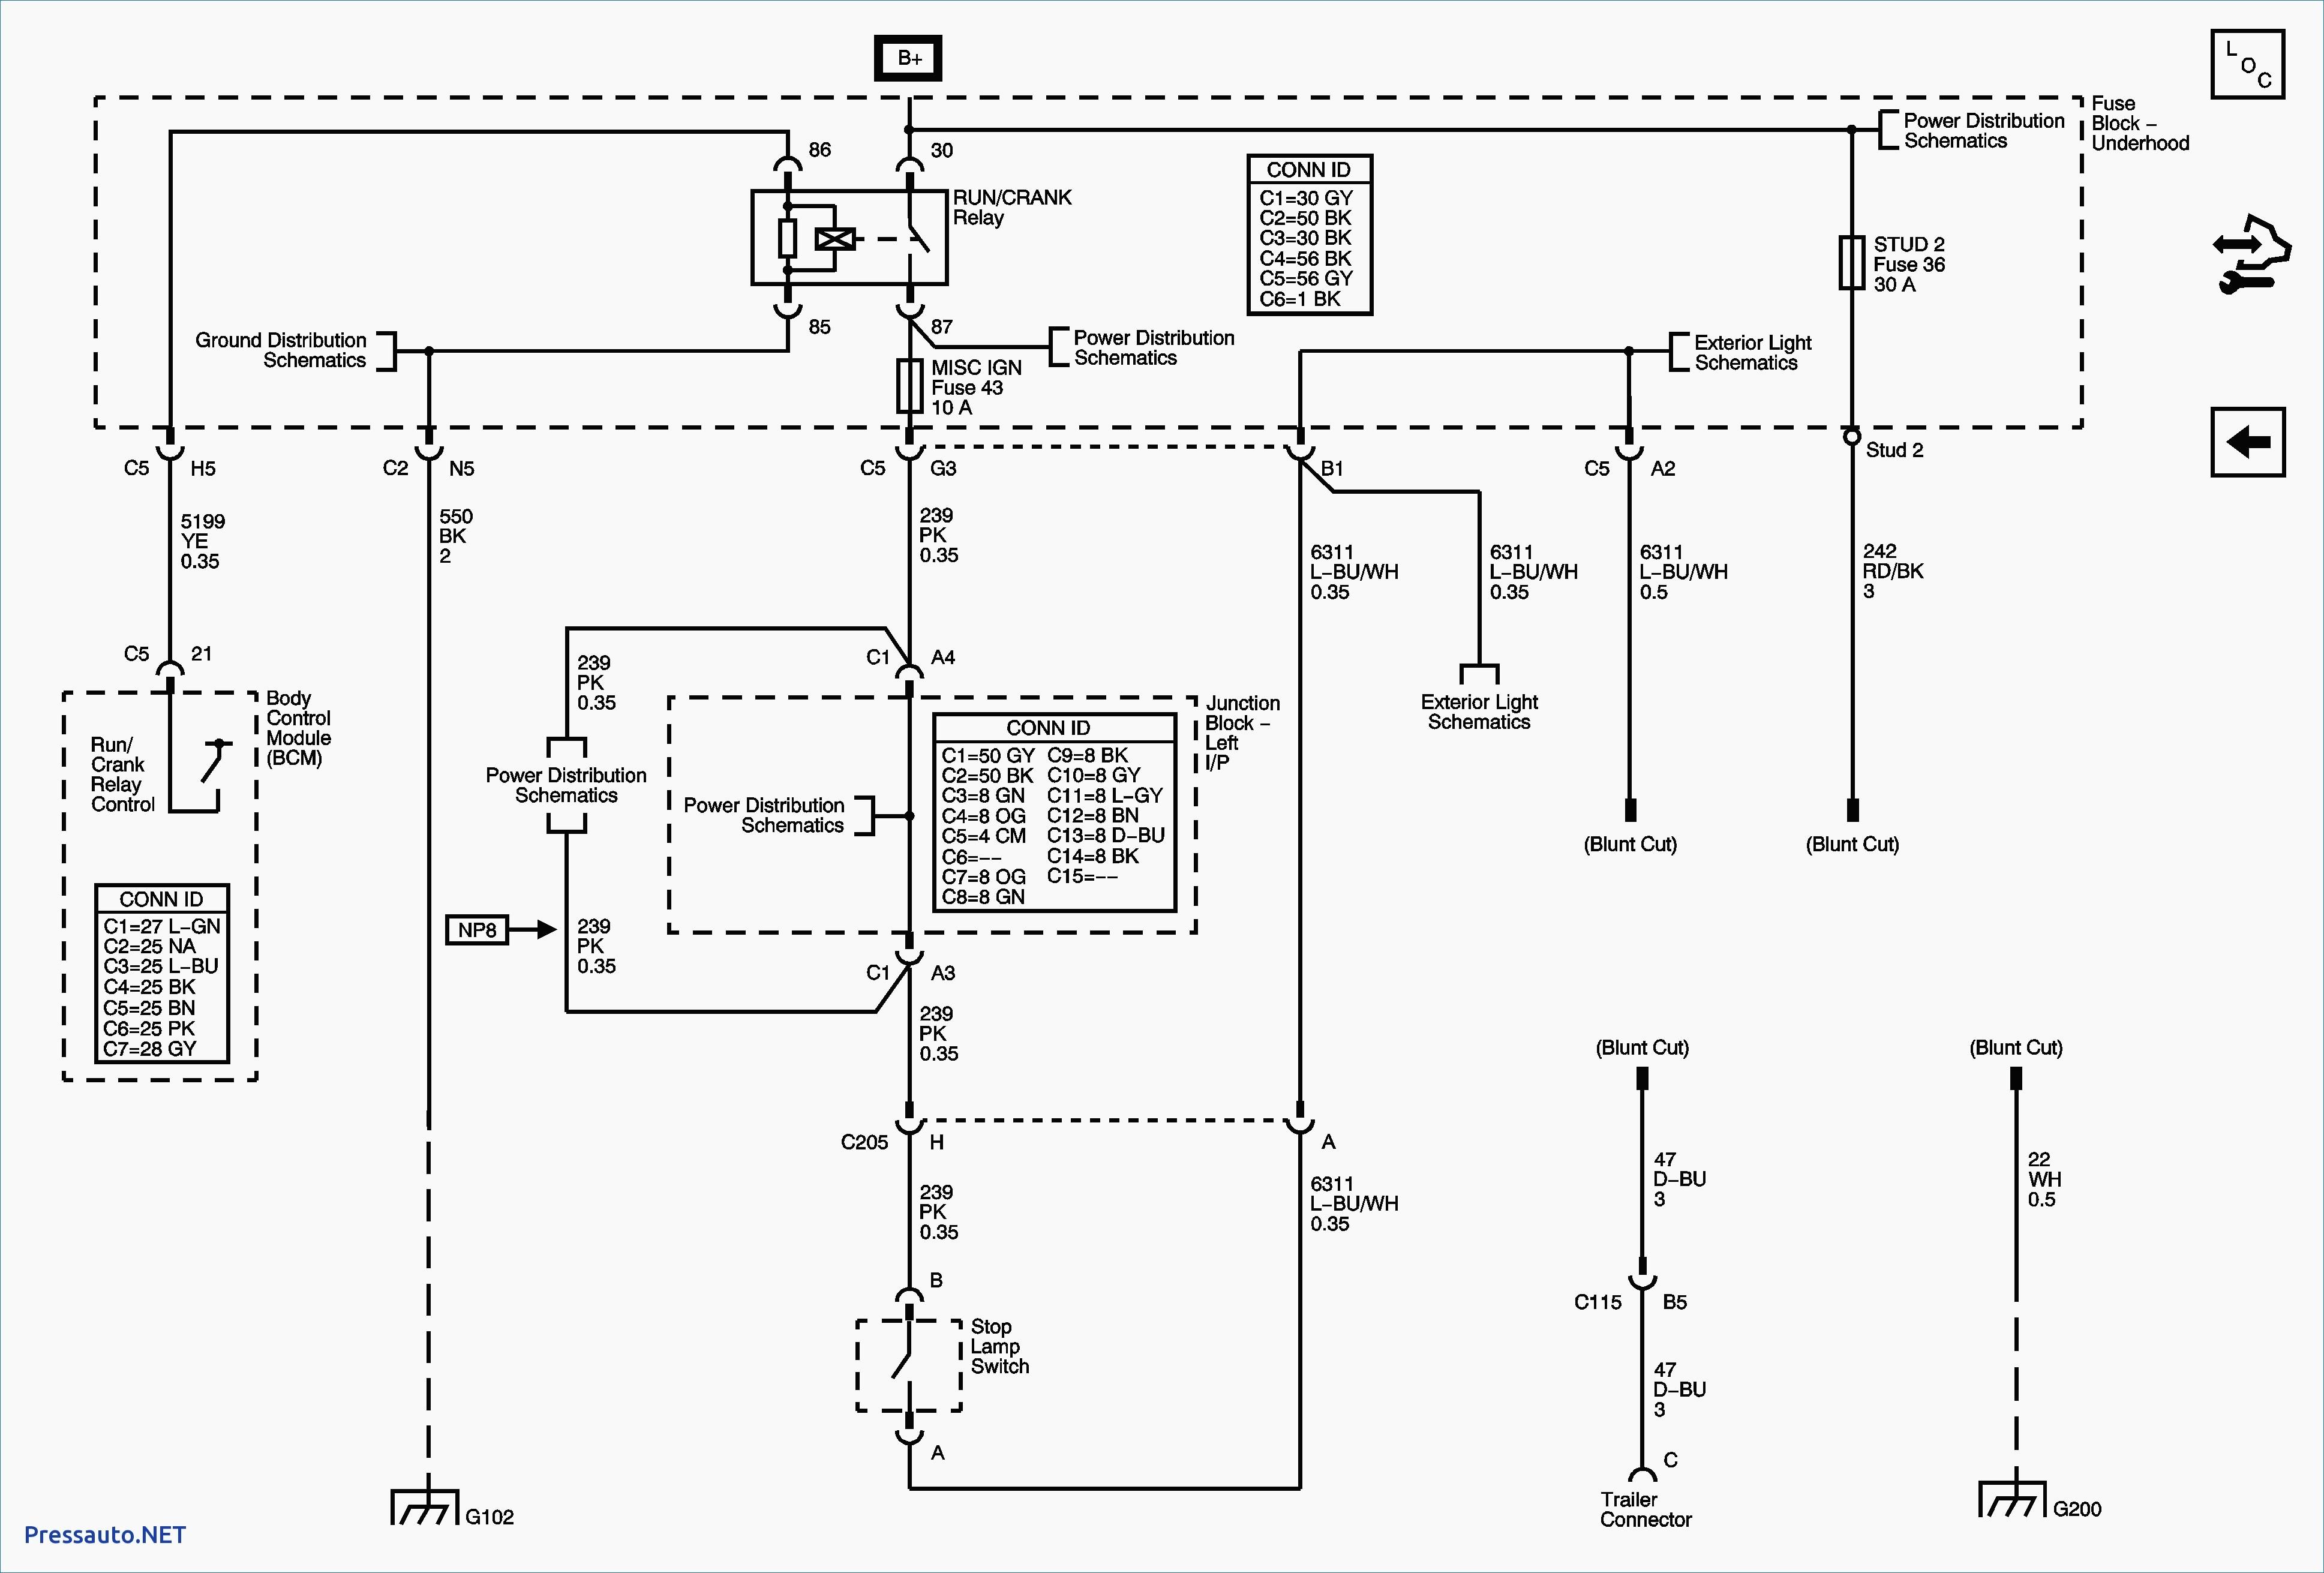 ford trailer brake controller wiring diagram Download-Wiring Diagram Trailer Electric Brakes Refrence Wiring Diagram for A Trailer Brake Controller New Trailer Wiring 7-j